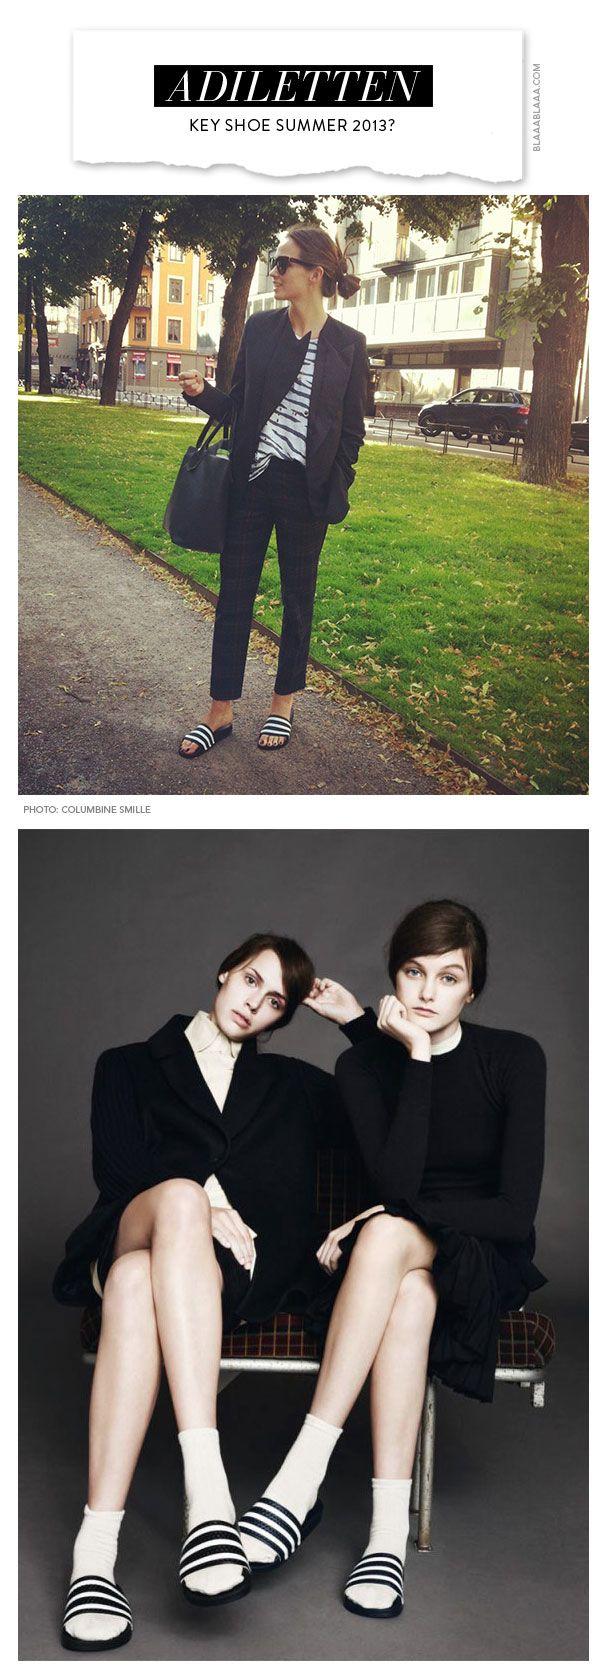 168 Best Images About Adilette On Pinterest Stripes